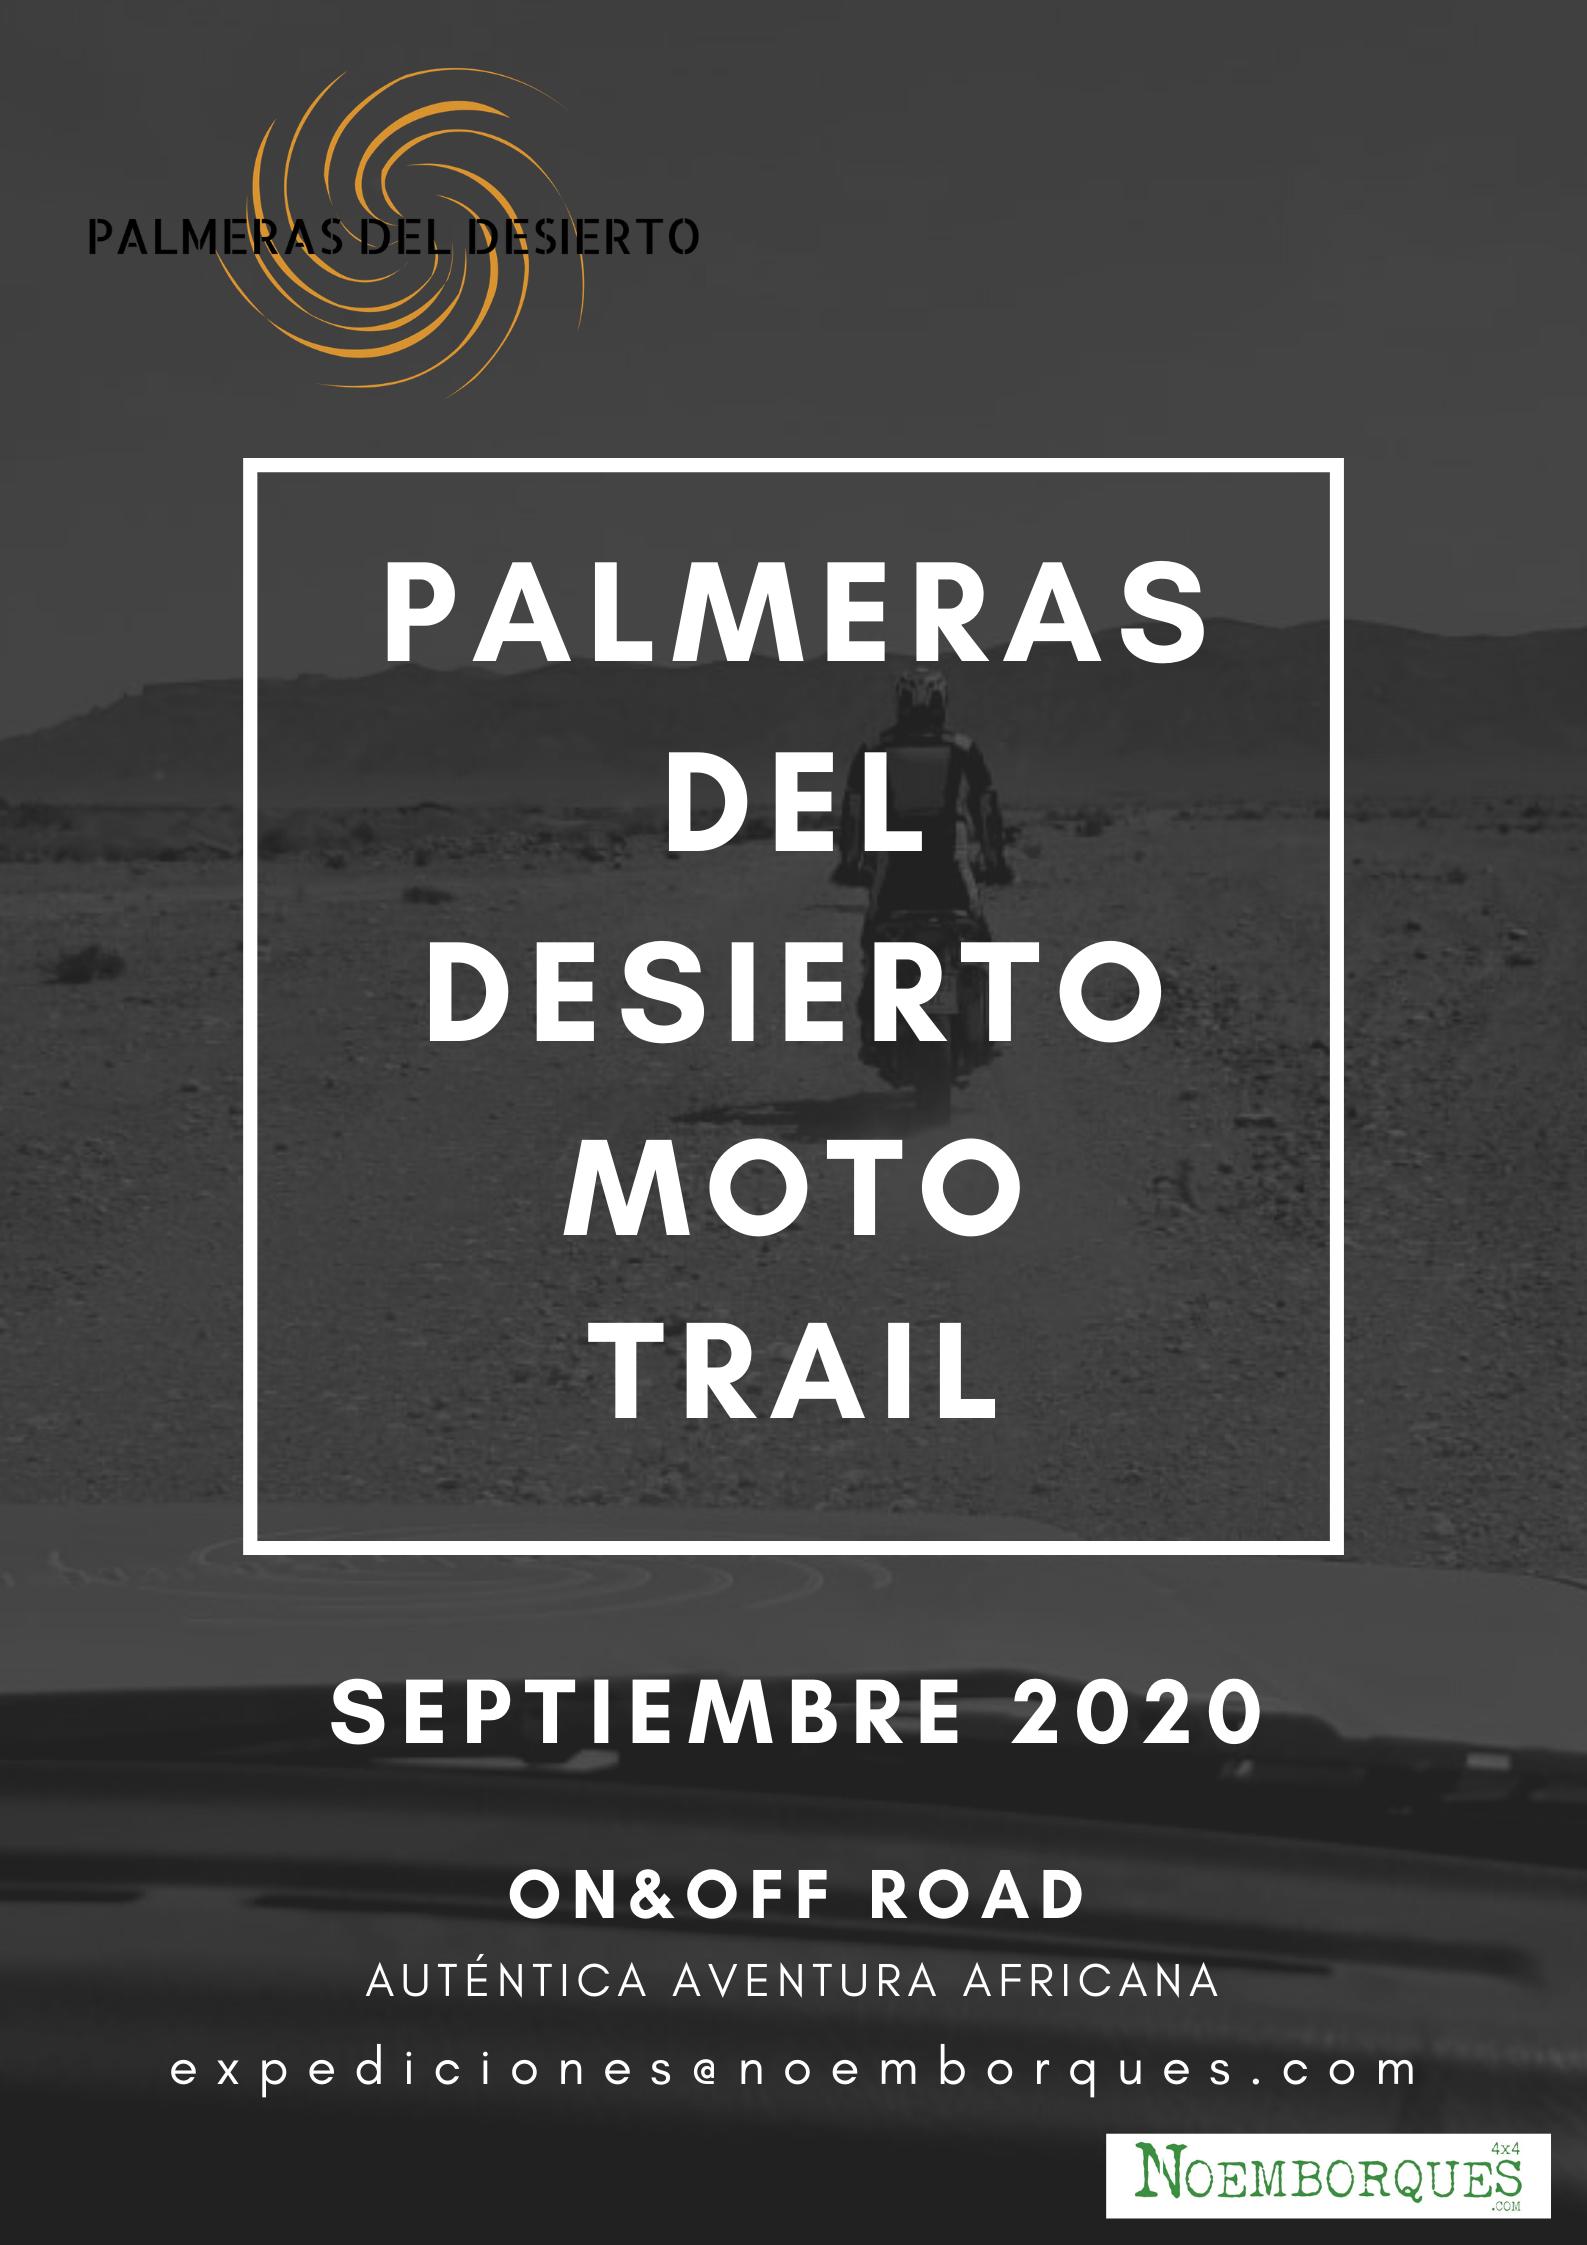 PALMERAS DEL DESIERTO MOTO TRAIL 2020